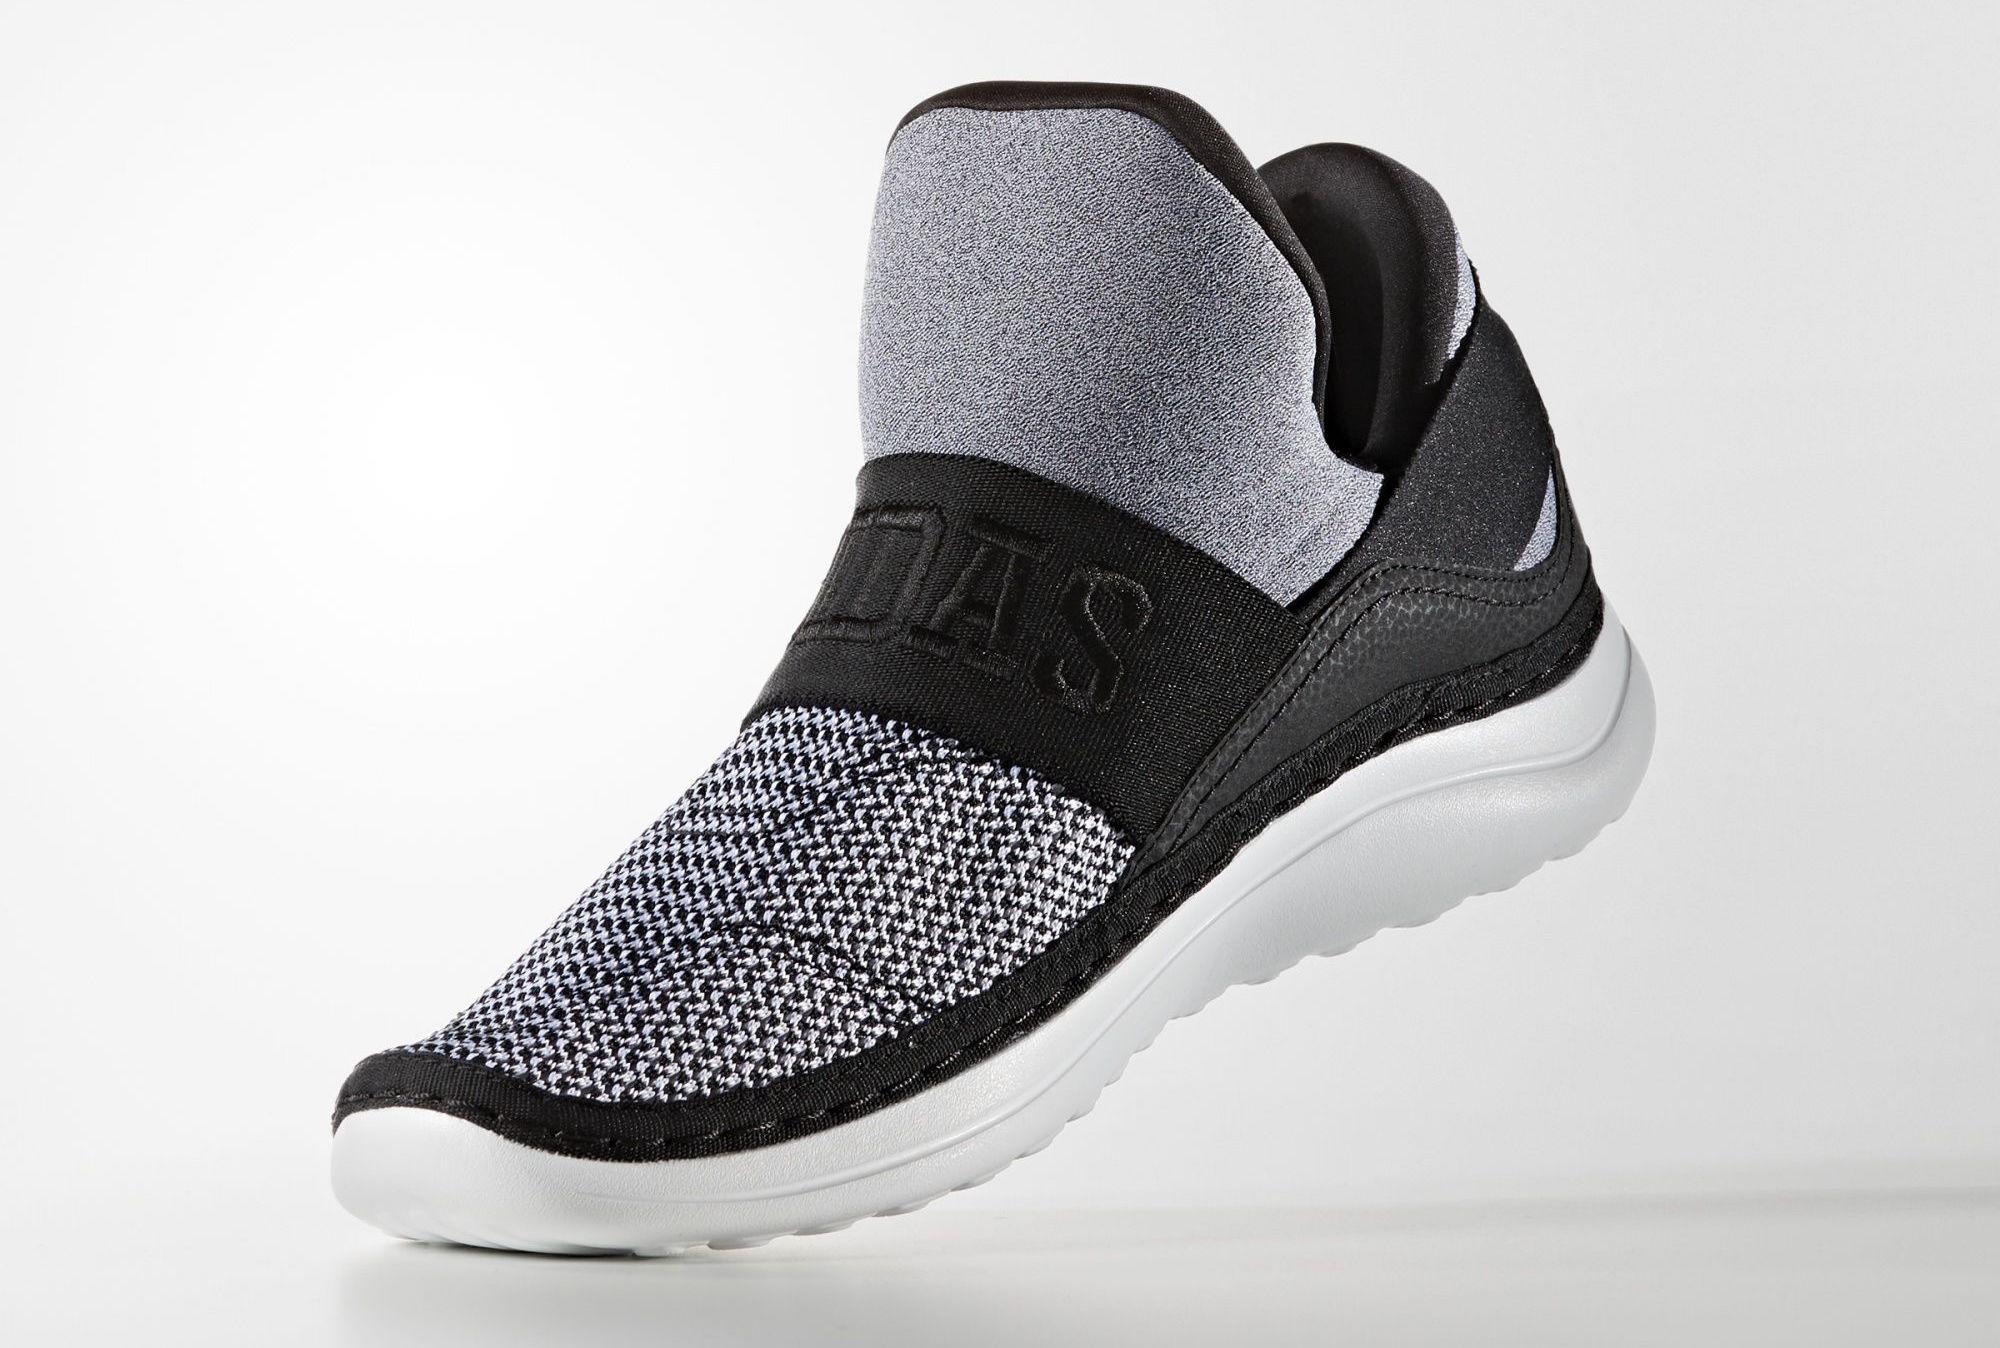 adidas-cloudfoam-ultra-zen-release-9